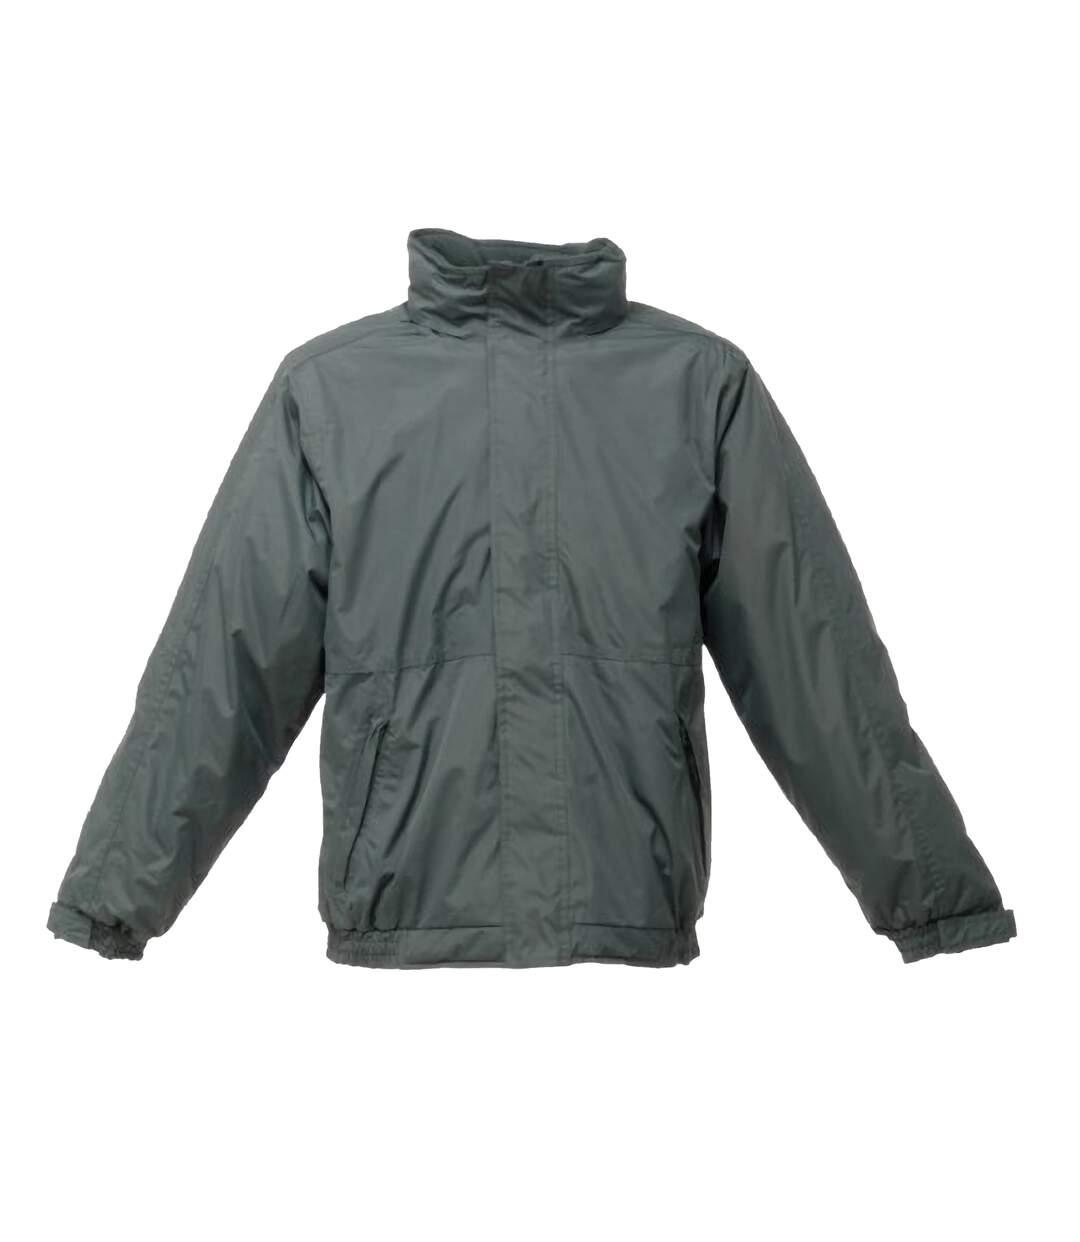 Regatta Dover Waterproof Windproof Jacket (Thermo-Guard Insulation) (Dark Green/Dark Green) - UTRG1425